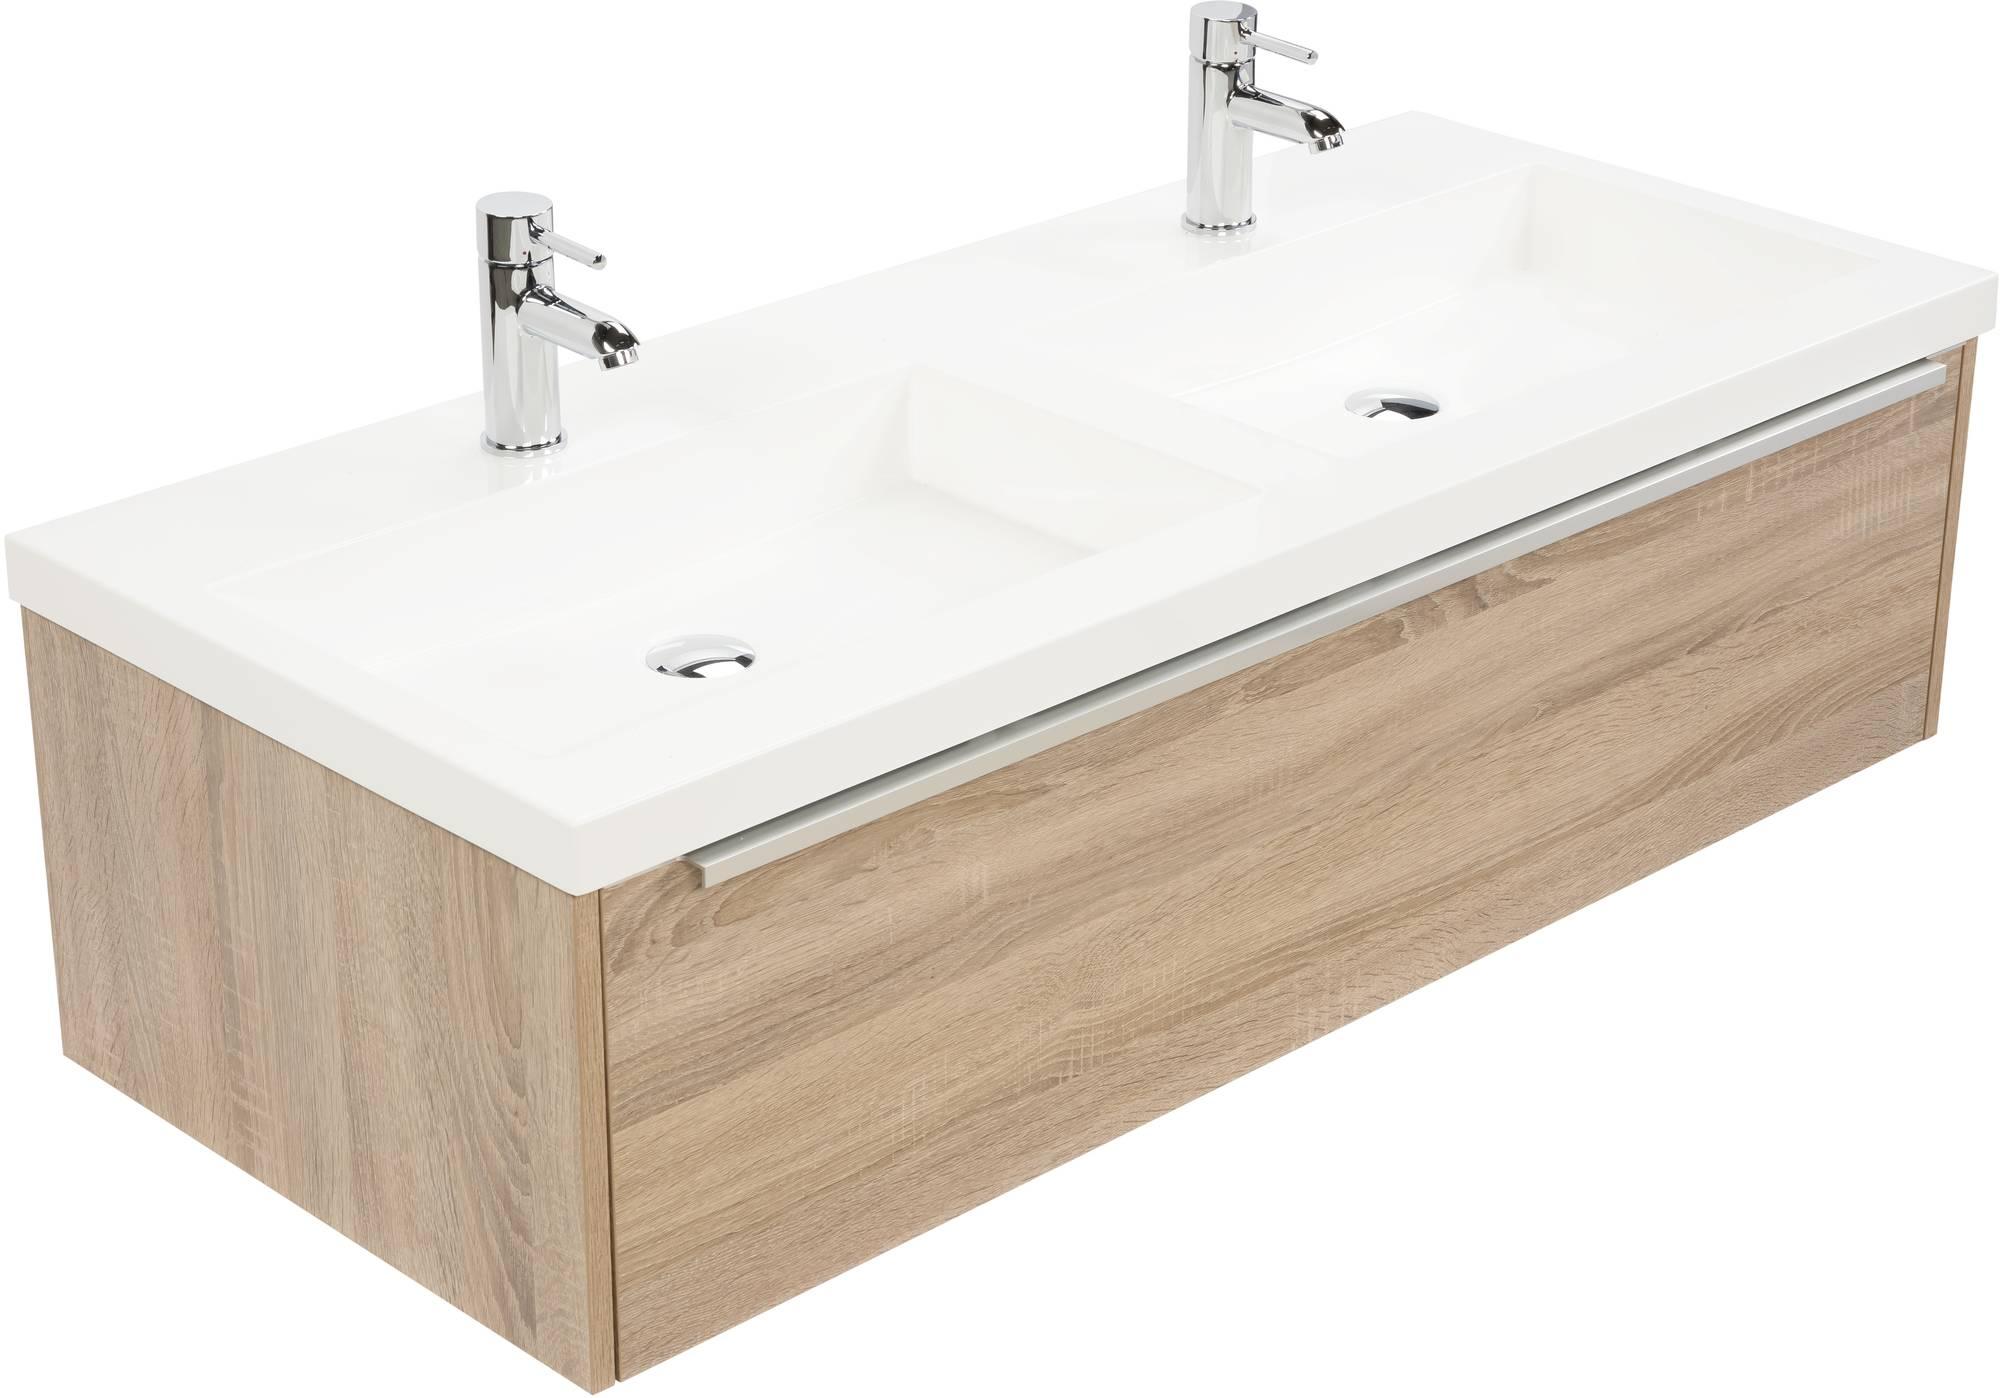 Saniselect Socan meubelset 1 lade met dubbele mineraalmarmere wastafel 120cm Bardolino Eiken